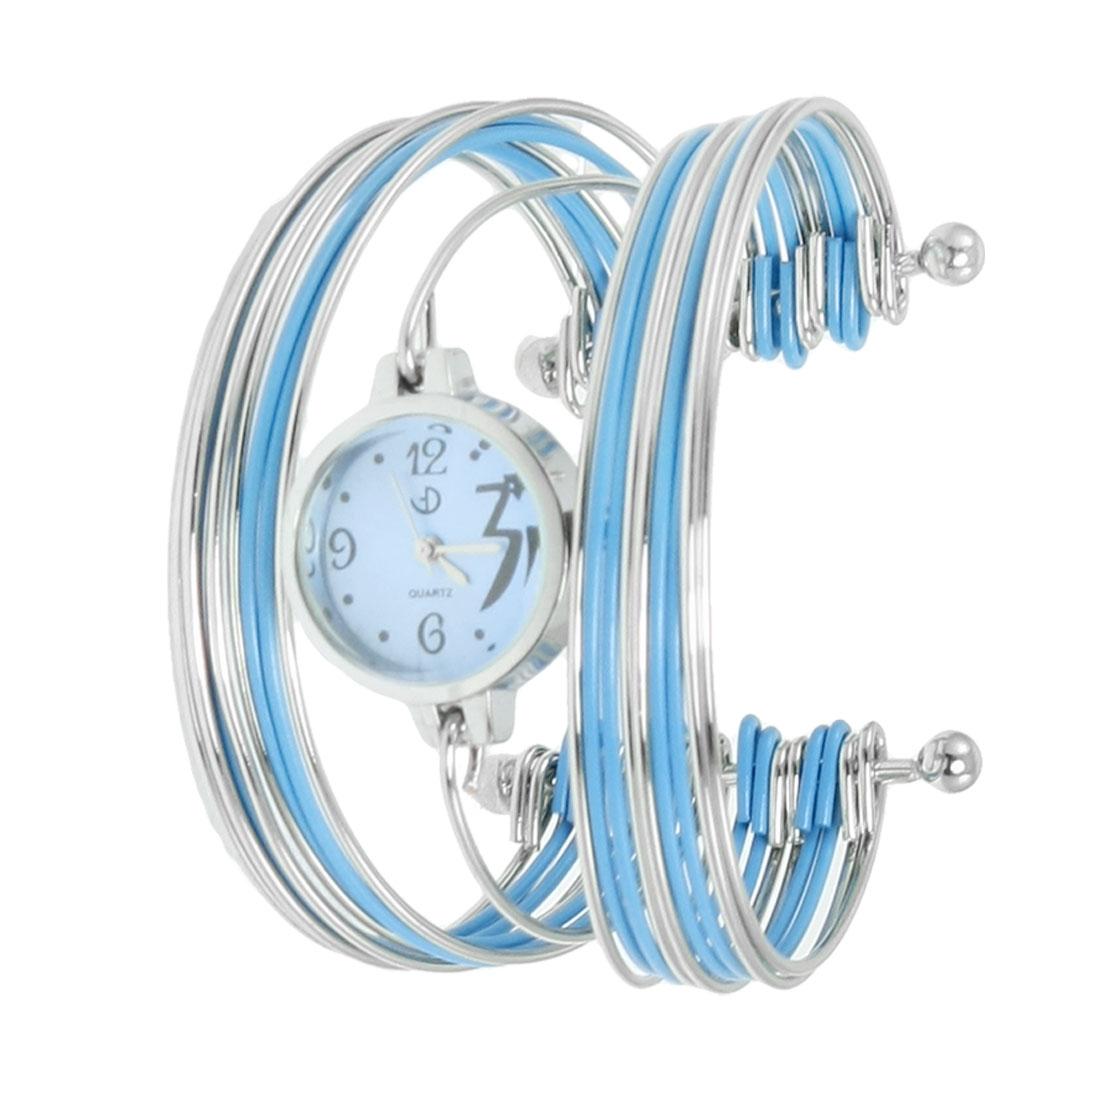 Blue Silver Tone Metal Multi Tier Round Dial Bangle Quartz Watch